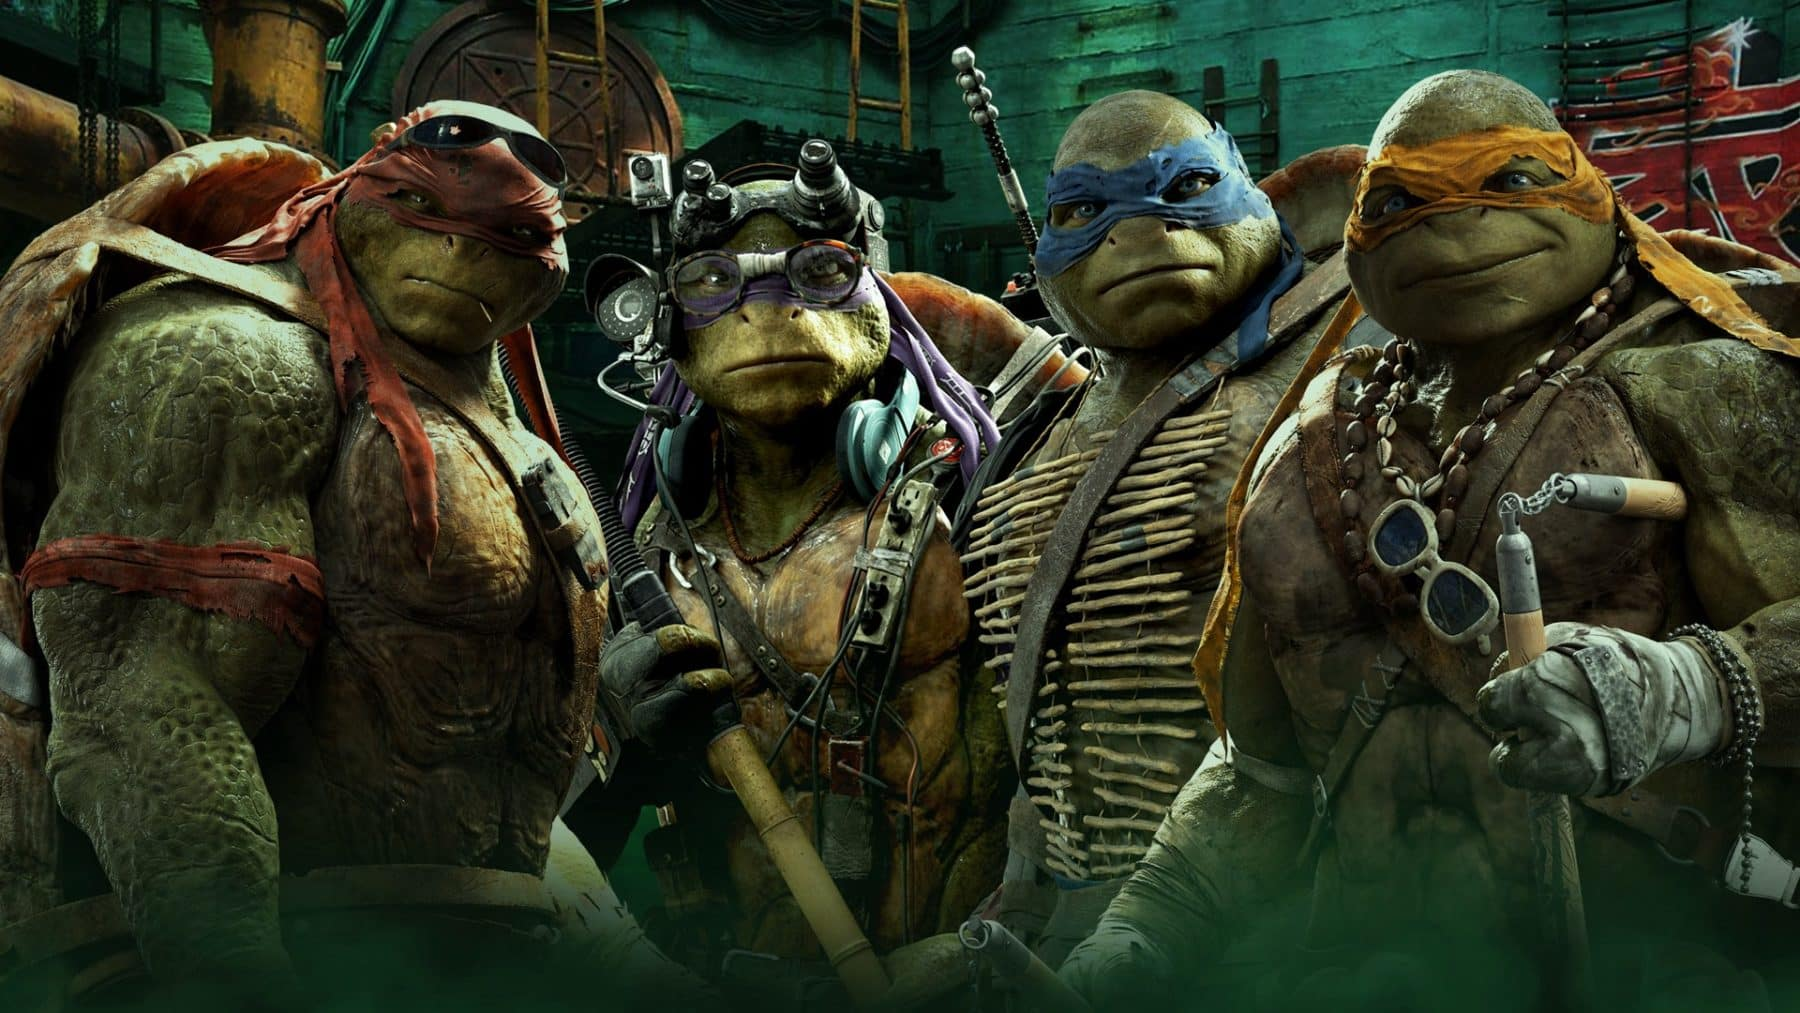 Paramount Pictures prepara nuevo reboot de las Tortugas Ninja teenage mutant ninja turtles